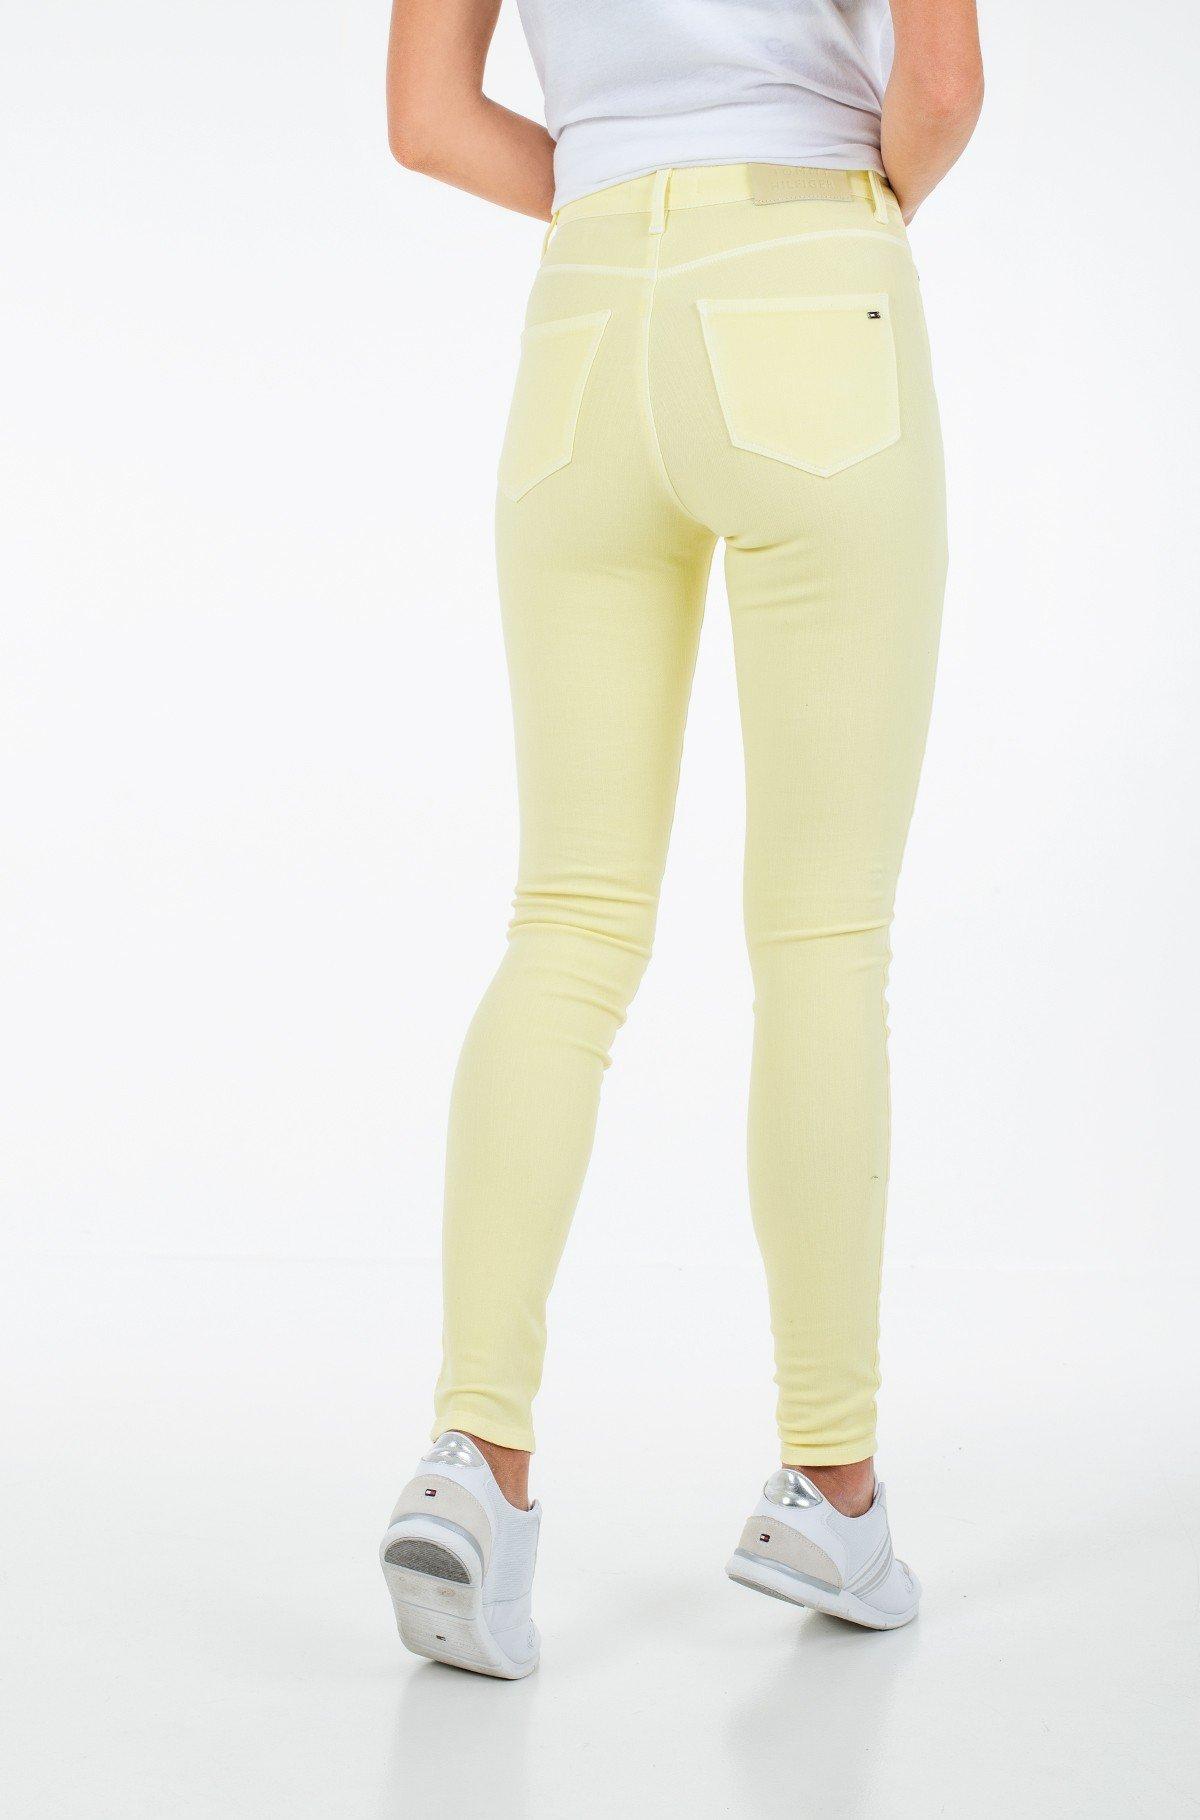 Jeans SCULPT U SKINNY HW ANKLE PANT-full-2